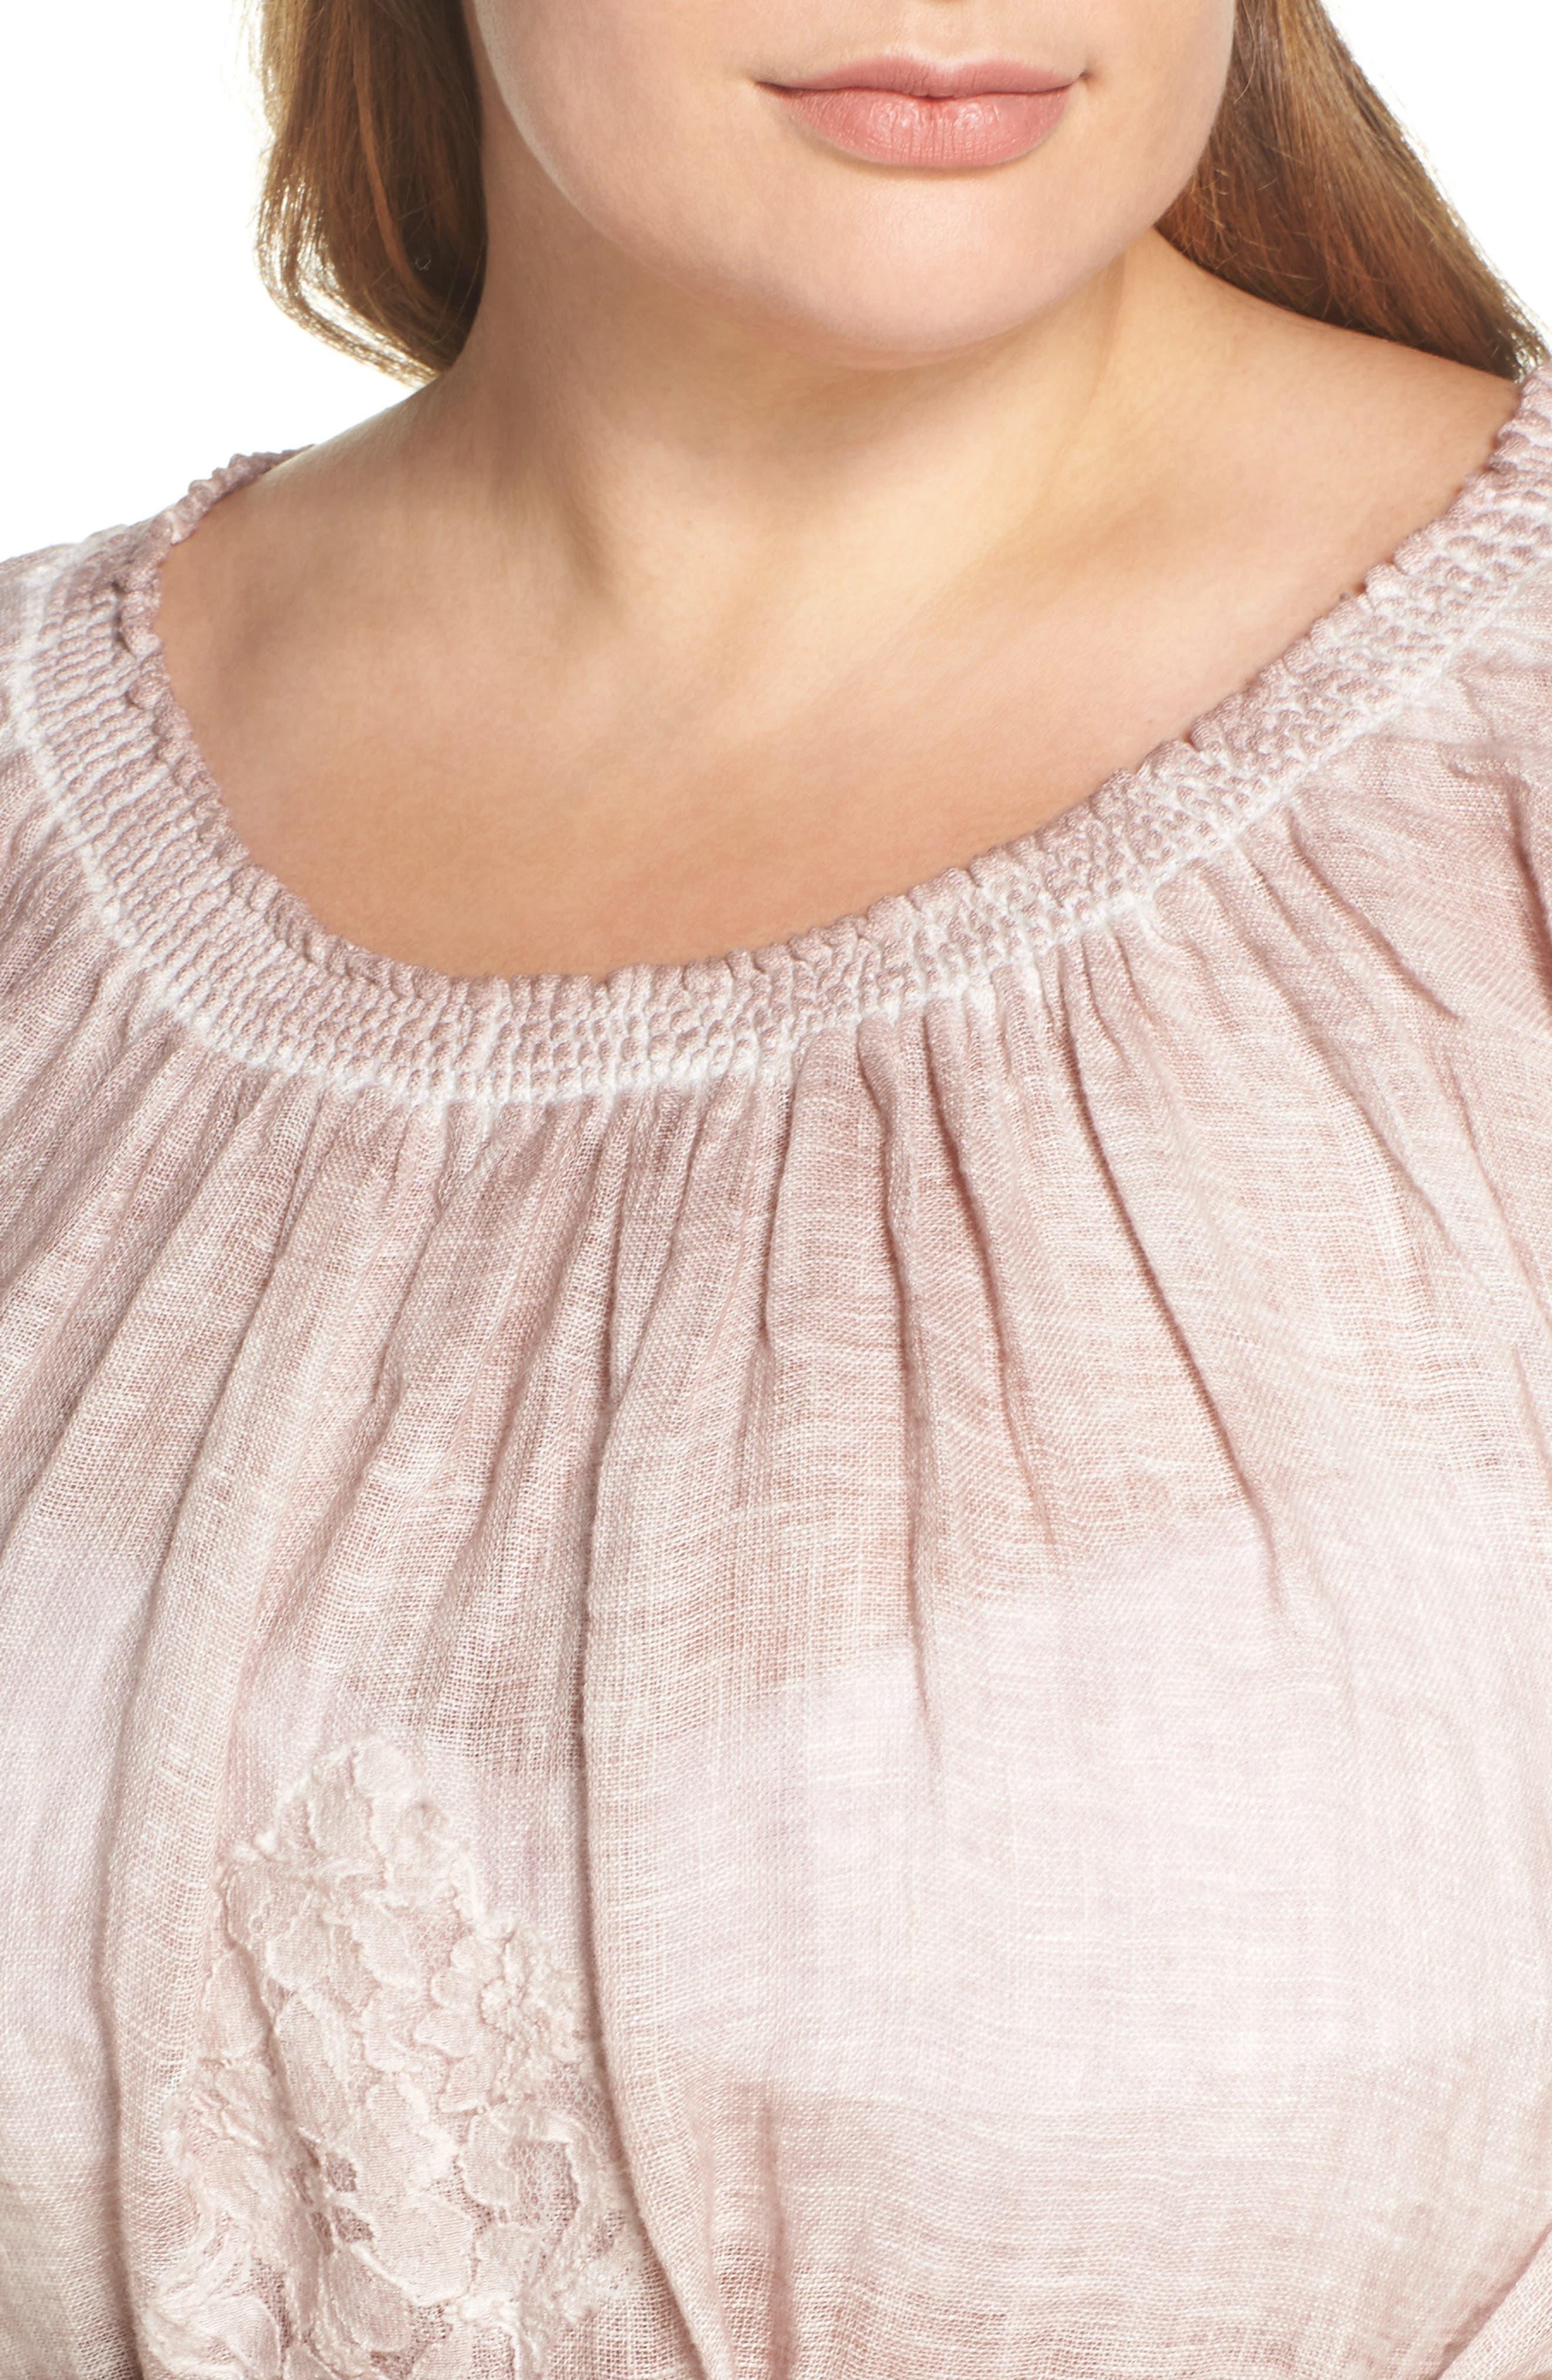 Daisy Linen Cover-Up Dress,                             Alternate thumbnail 4, color,                             652